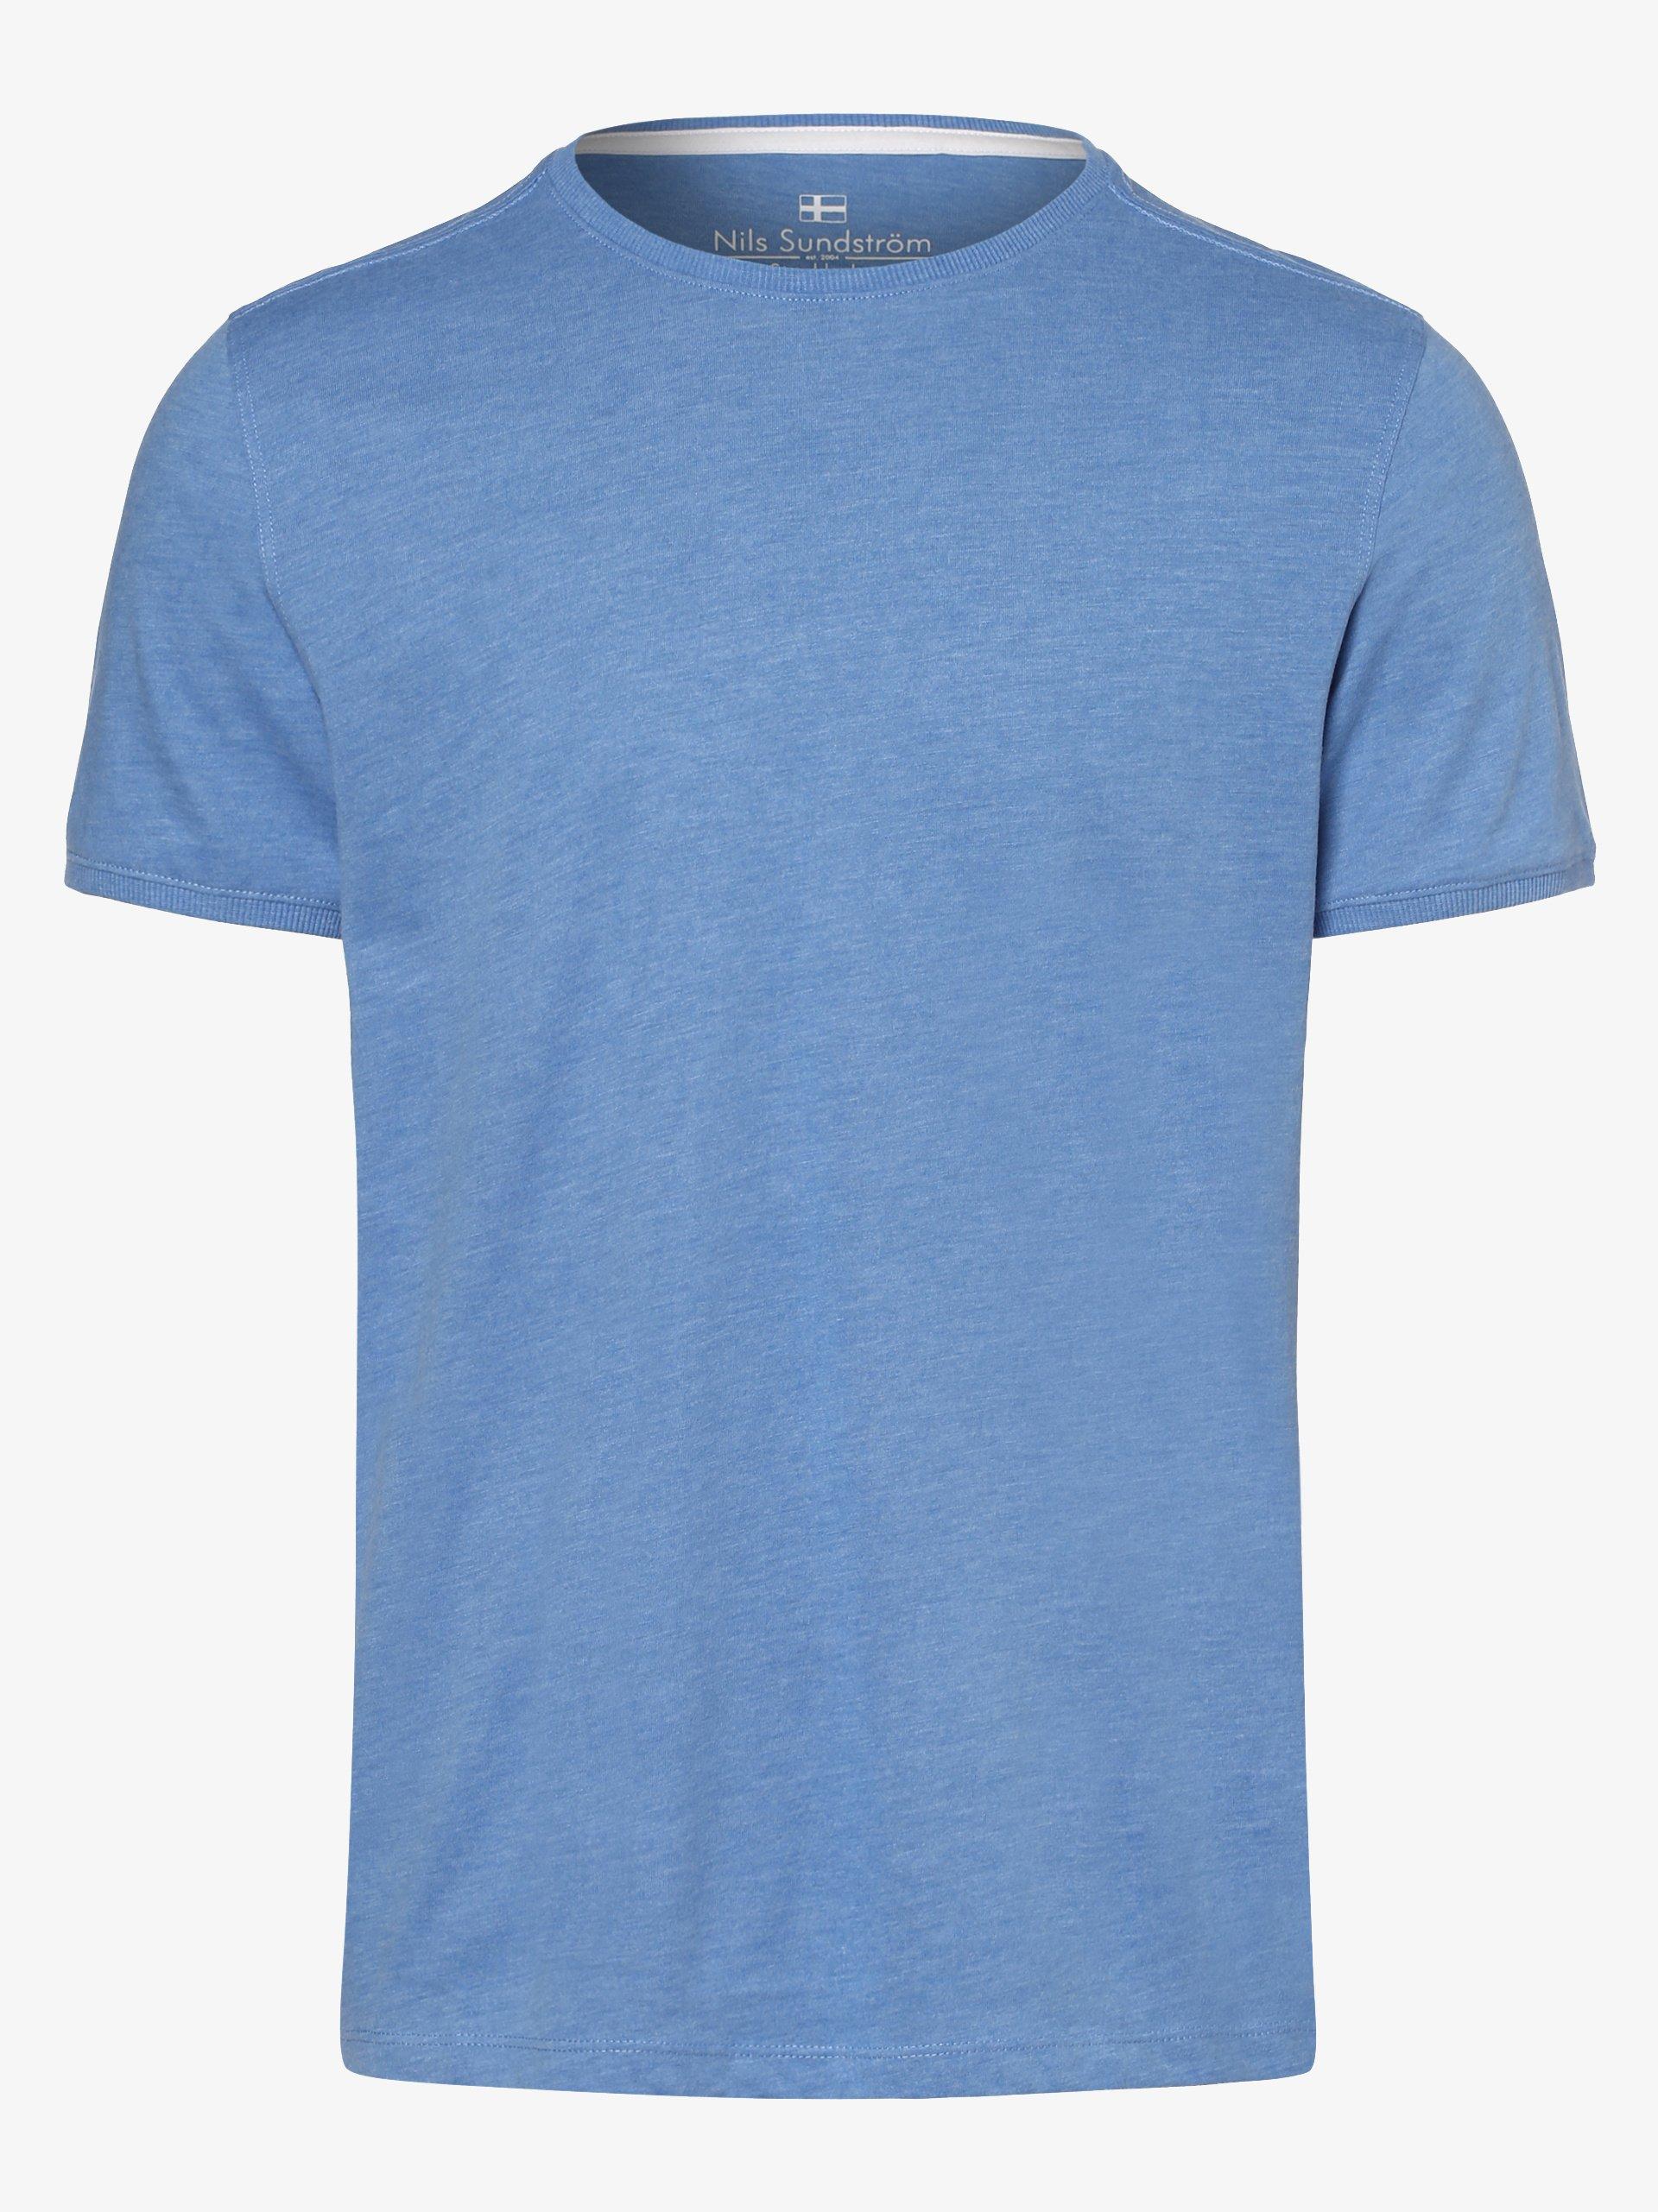 Nils Sundström Herren T-Shirt